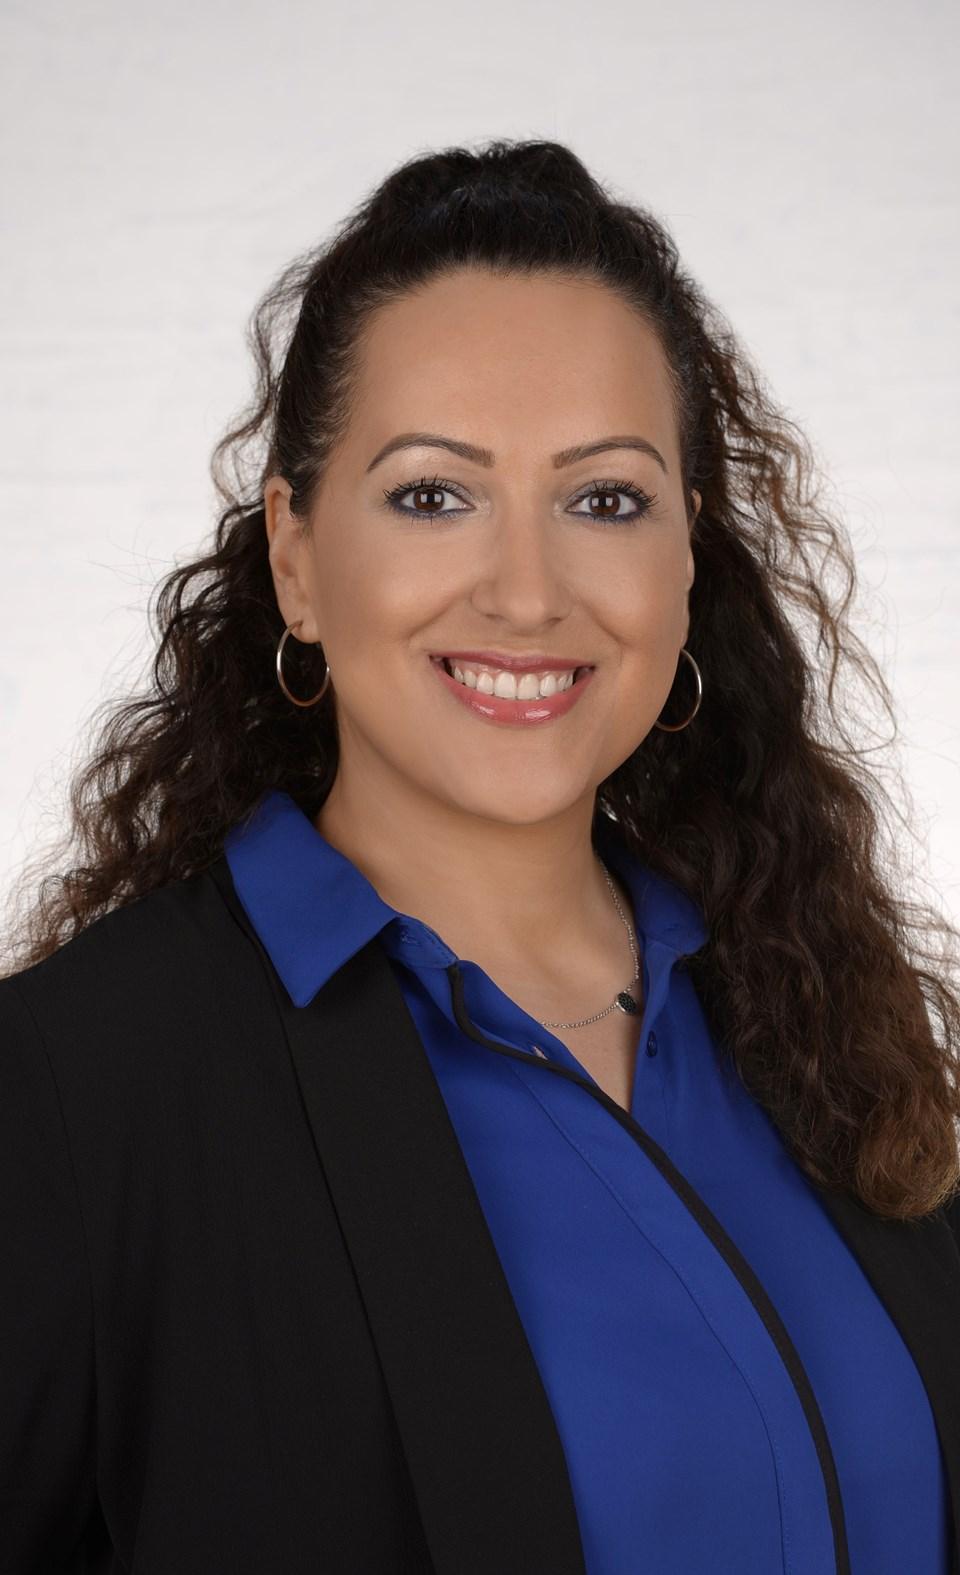 Uzman Klinik Psikolog – Psikoterapist Nazan Topal Eren